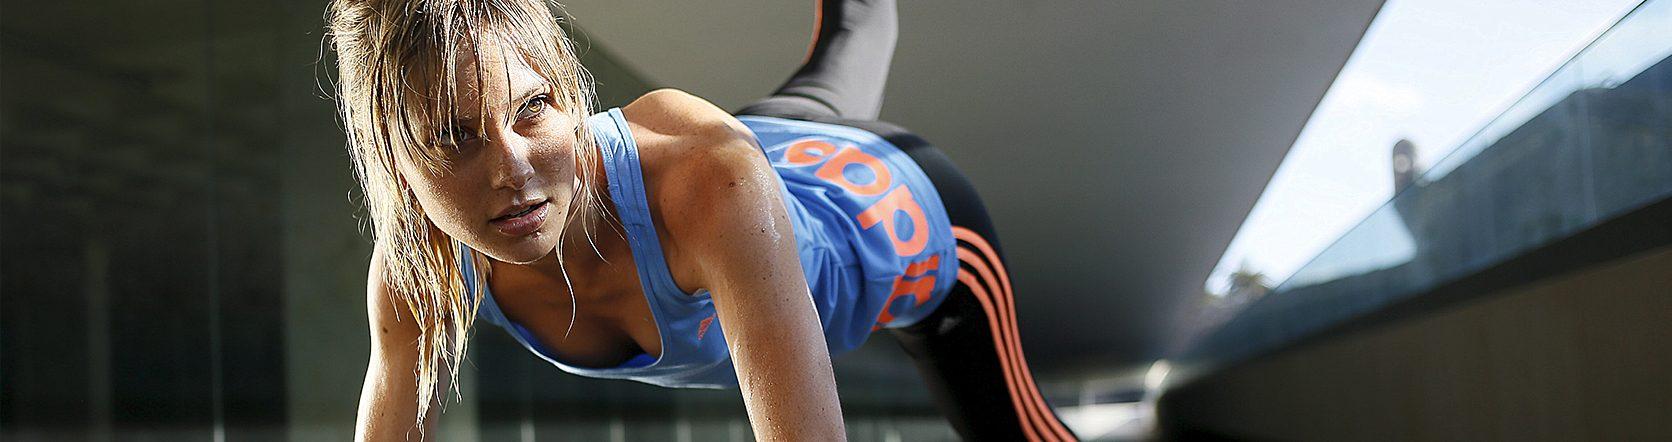 Fitnesstraining bei Zeitmangel